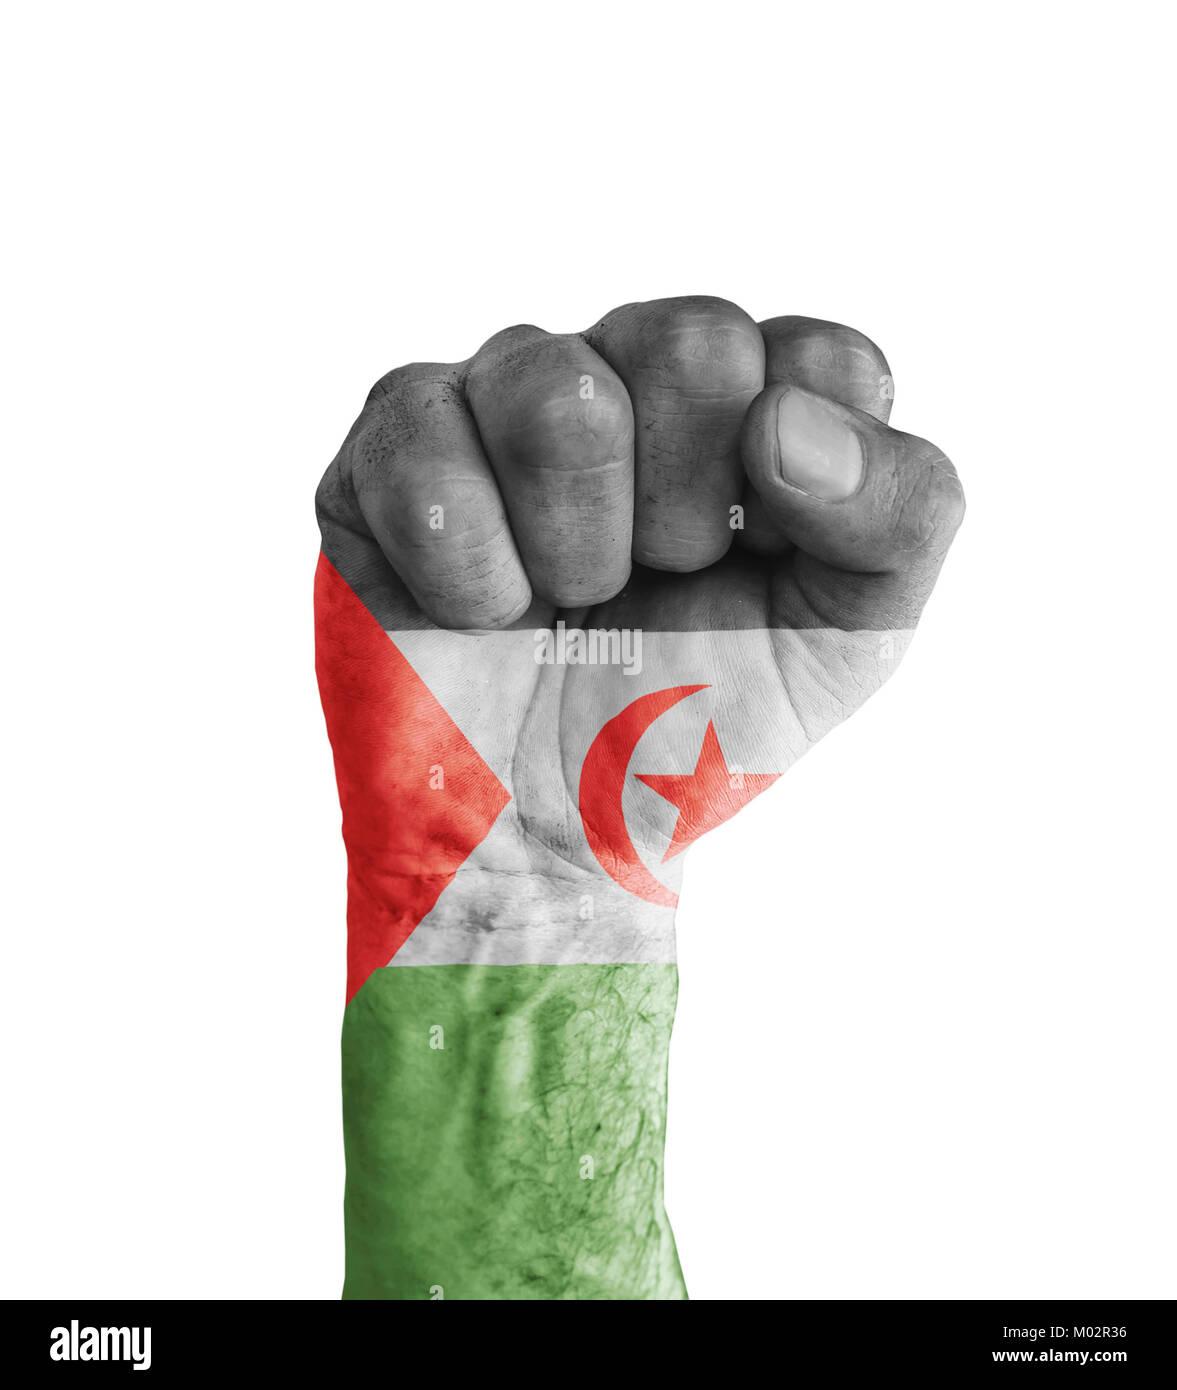 Flag of Sahrawi Arab Democratic Republic painted on human fist like victory symbol - Stock Image